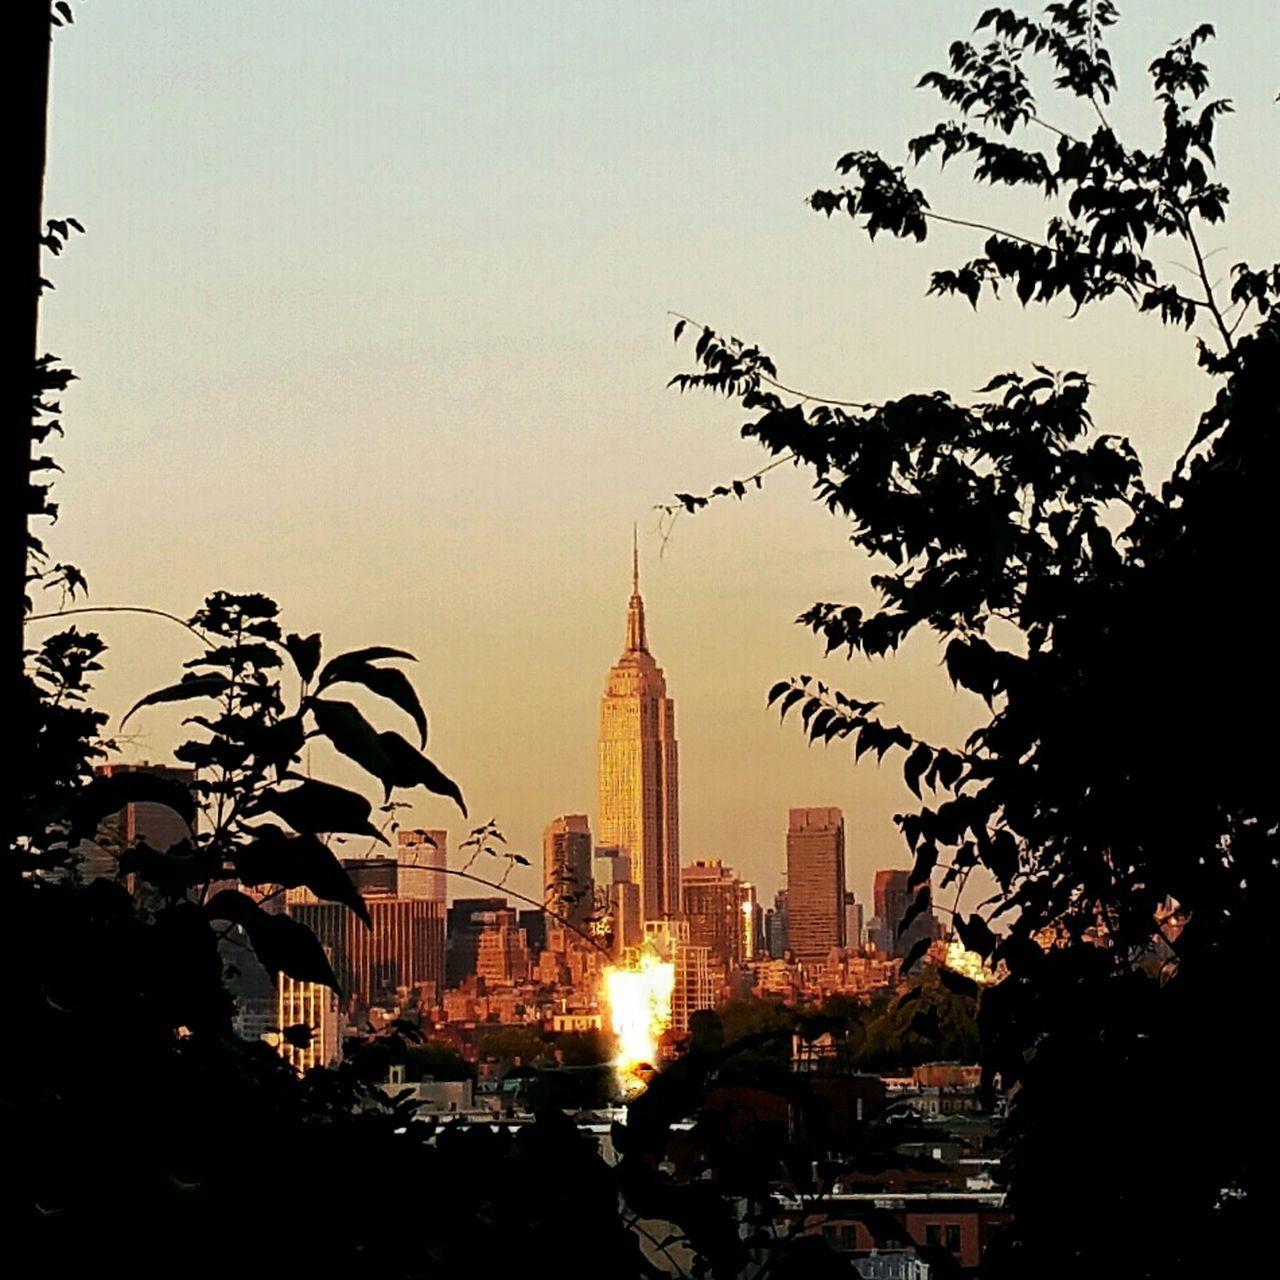 Glitch Glare Sun Glare Sunset Lift Off Rocketship Empire State Building NYC Skyline